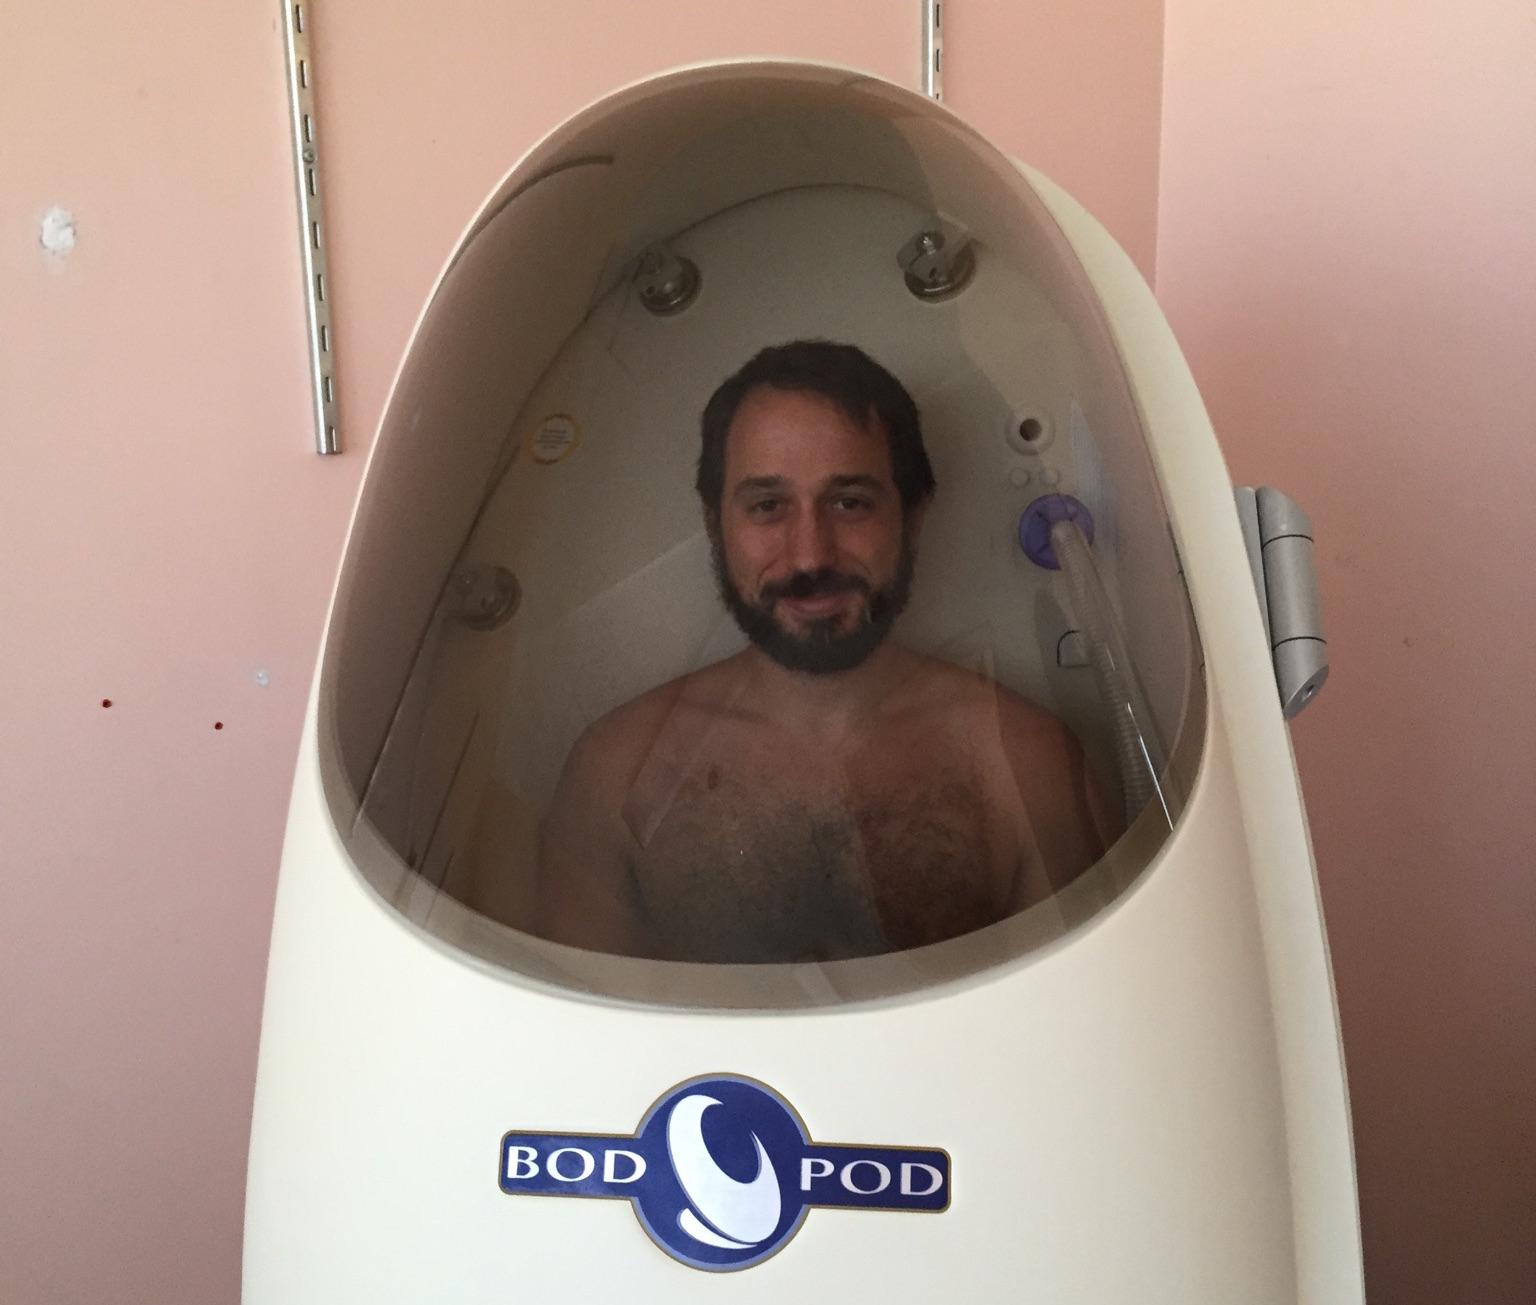 The_Bod_Pod